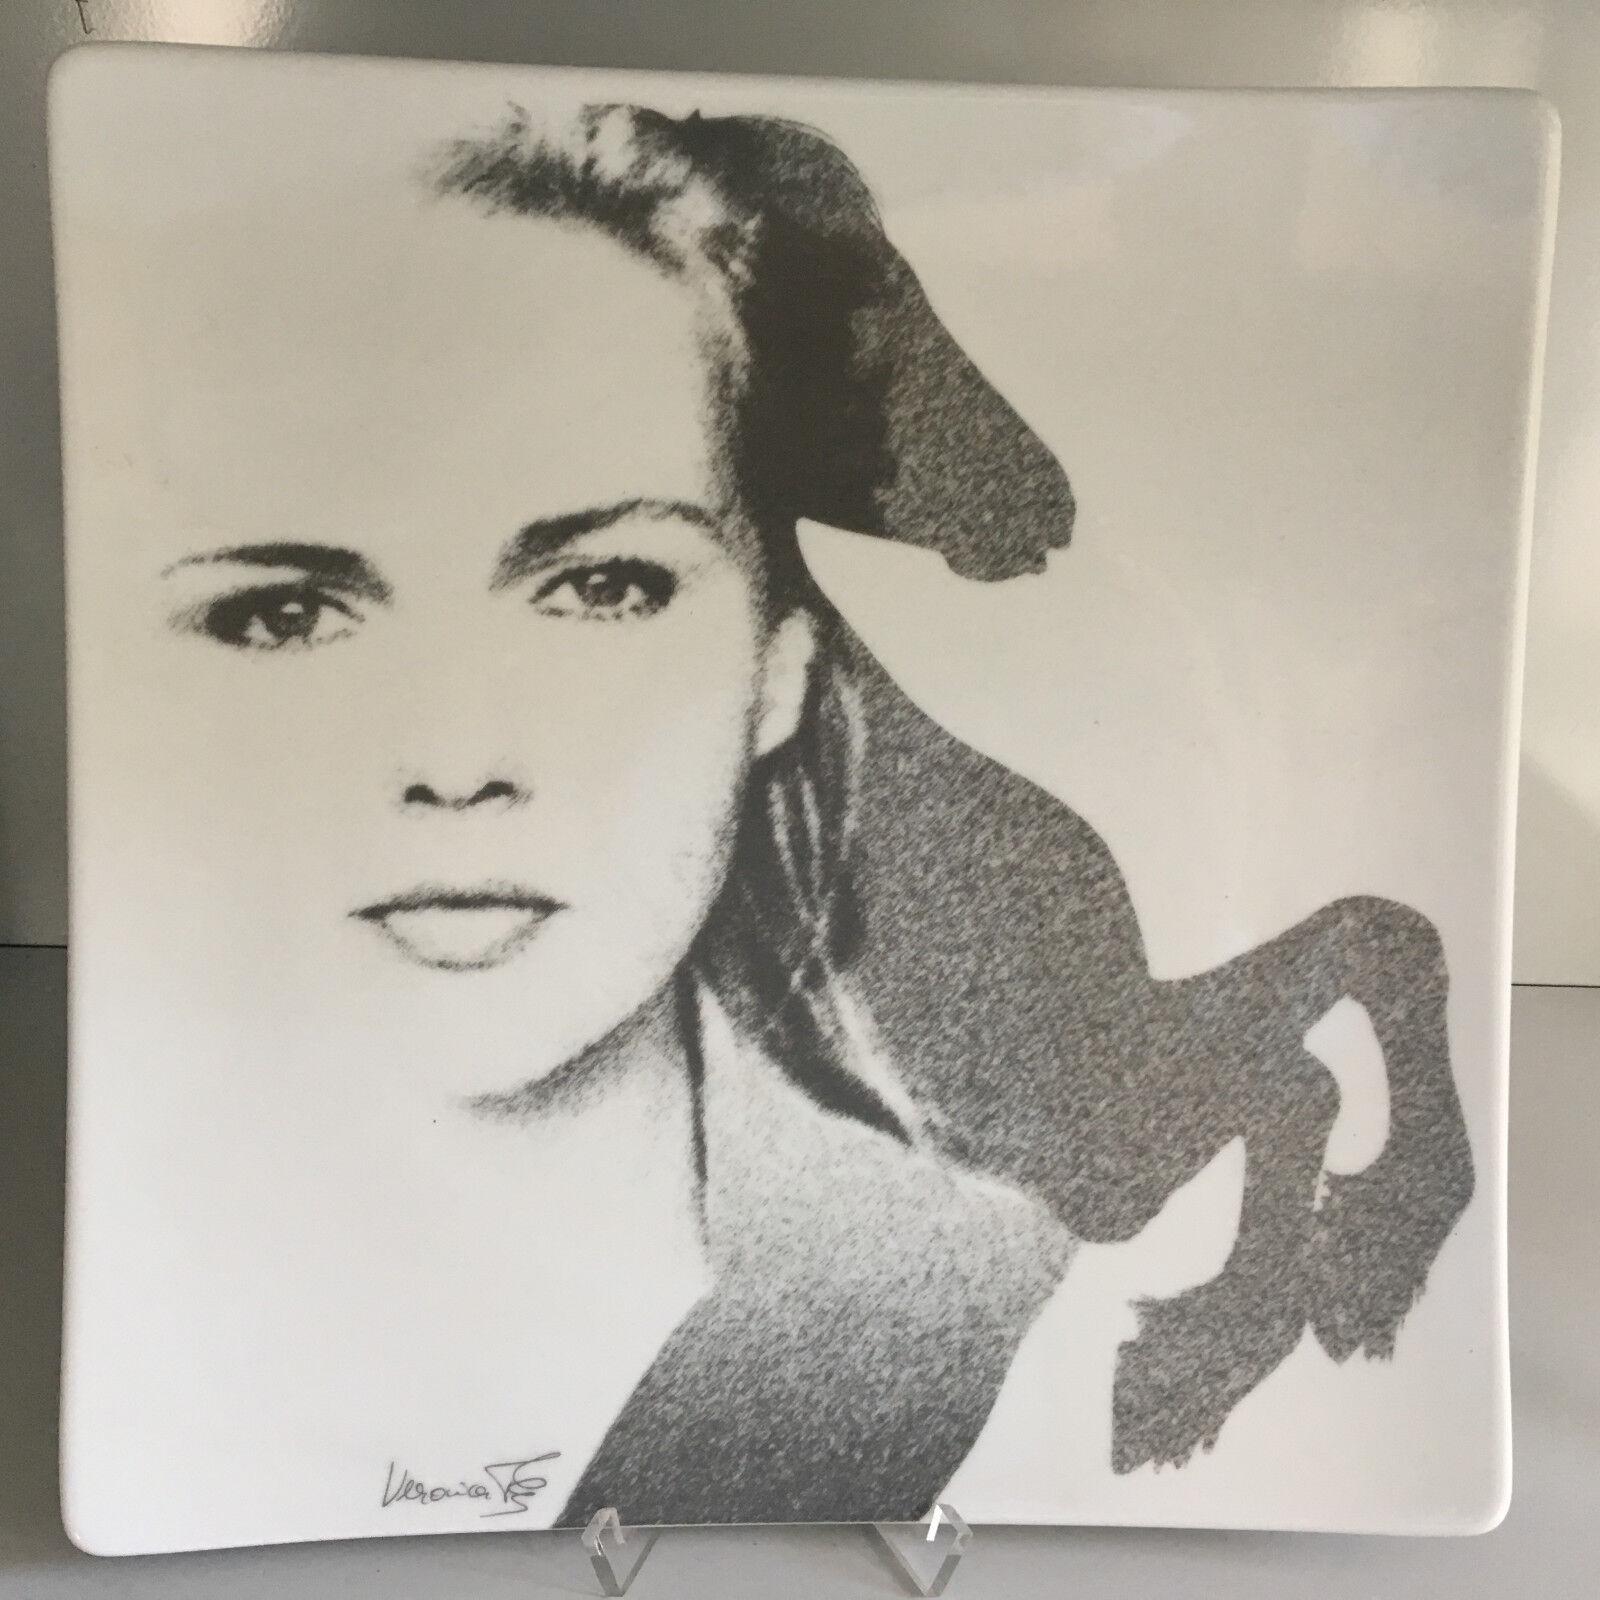 Rosanthal CELEBRITY ART EDITION 1 2 3 Künstler WANDTELLER WANDTELLER WANDTELLER 31 cm  Sammelteller | ein guter Ruf in der Welt  e1e845